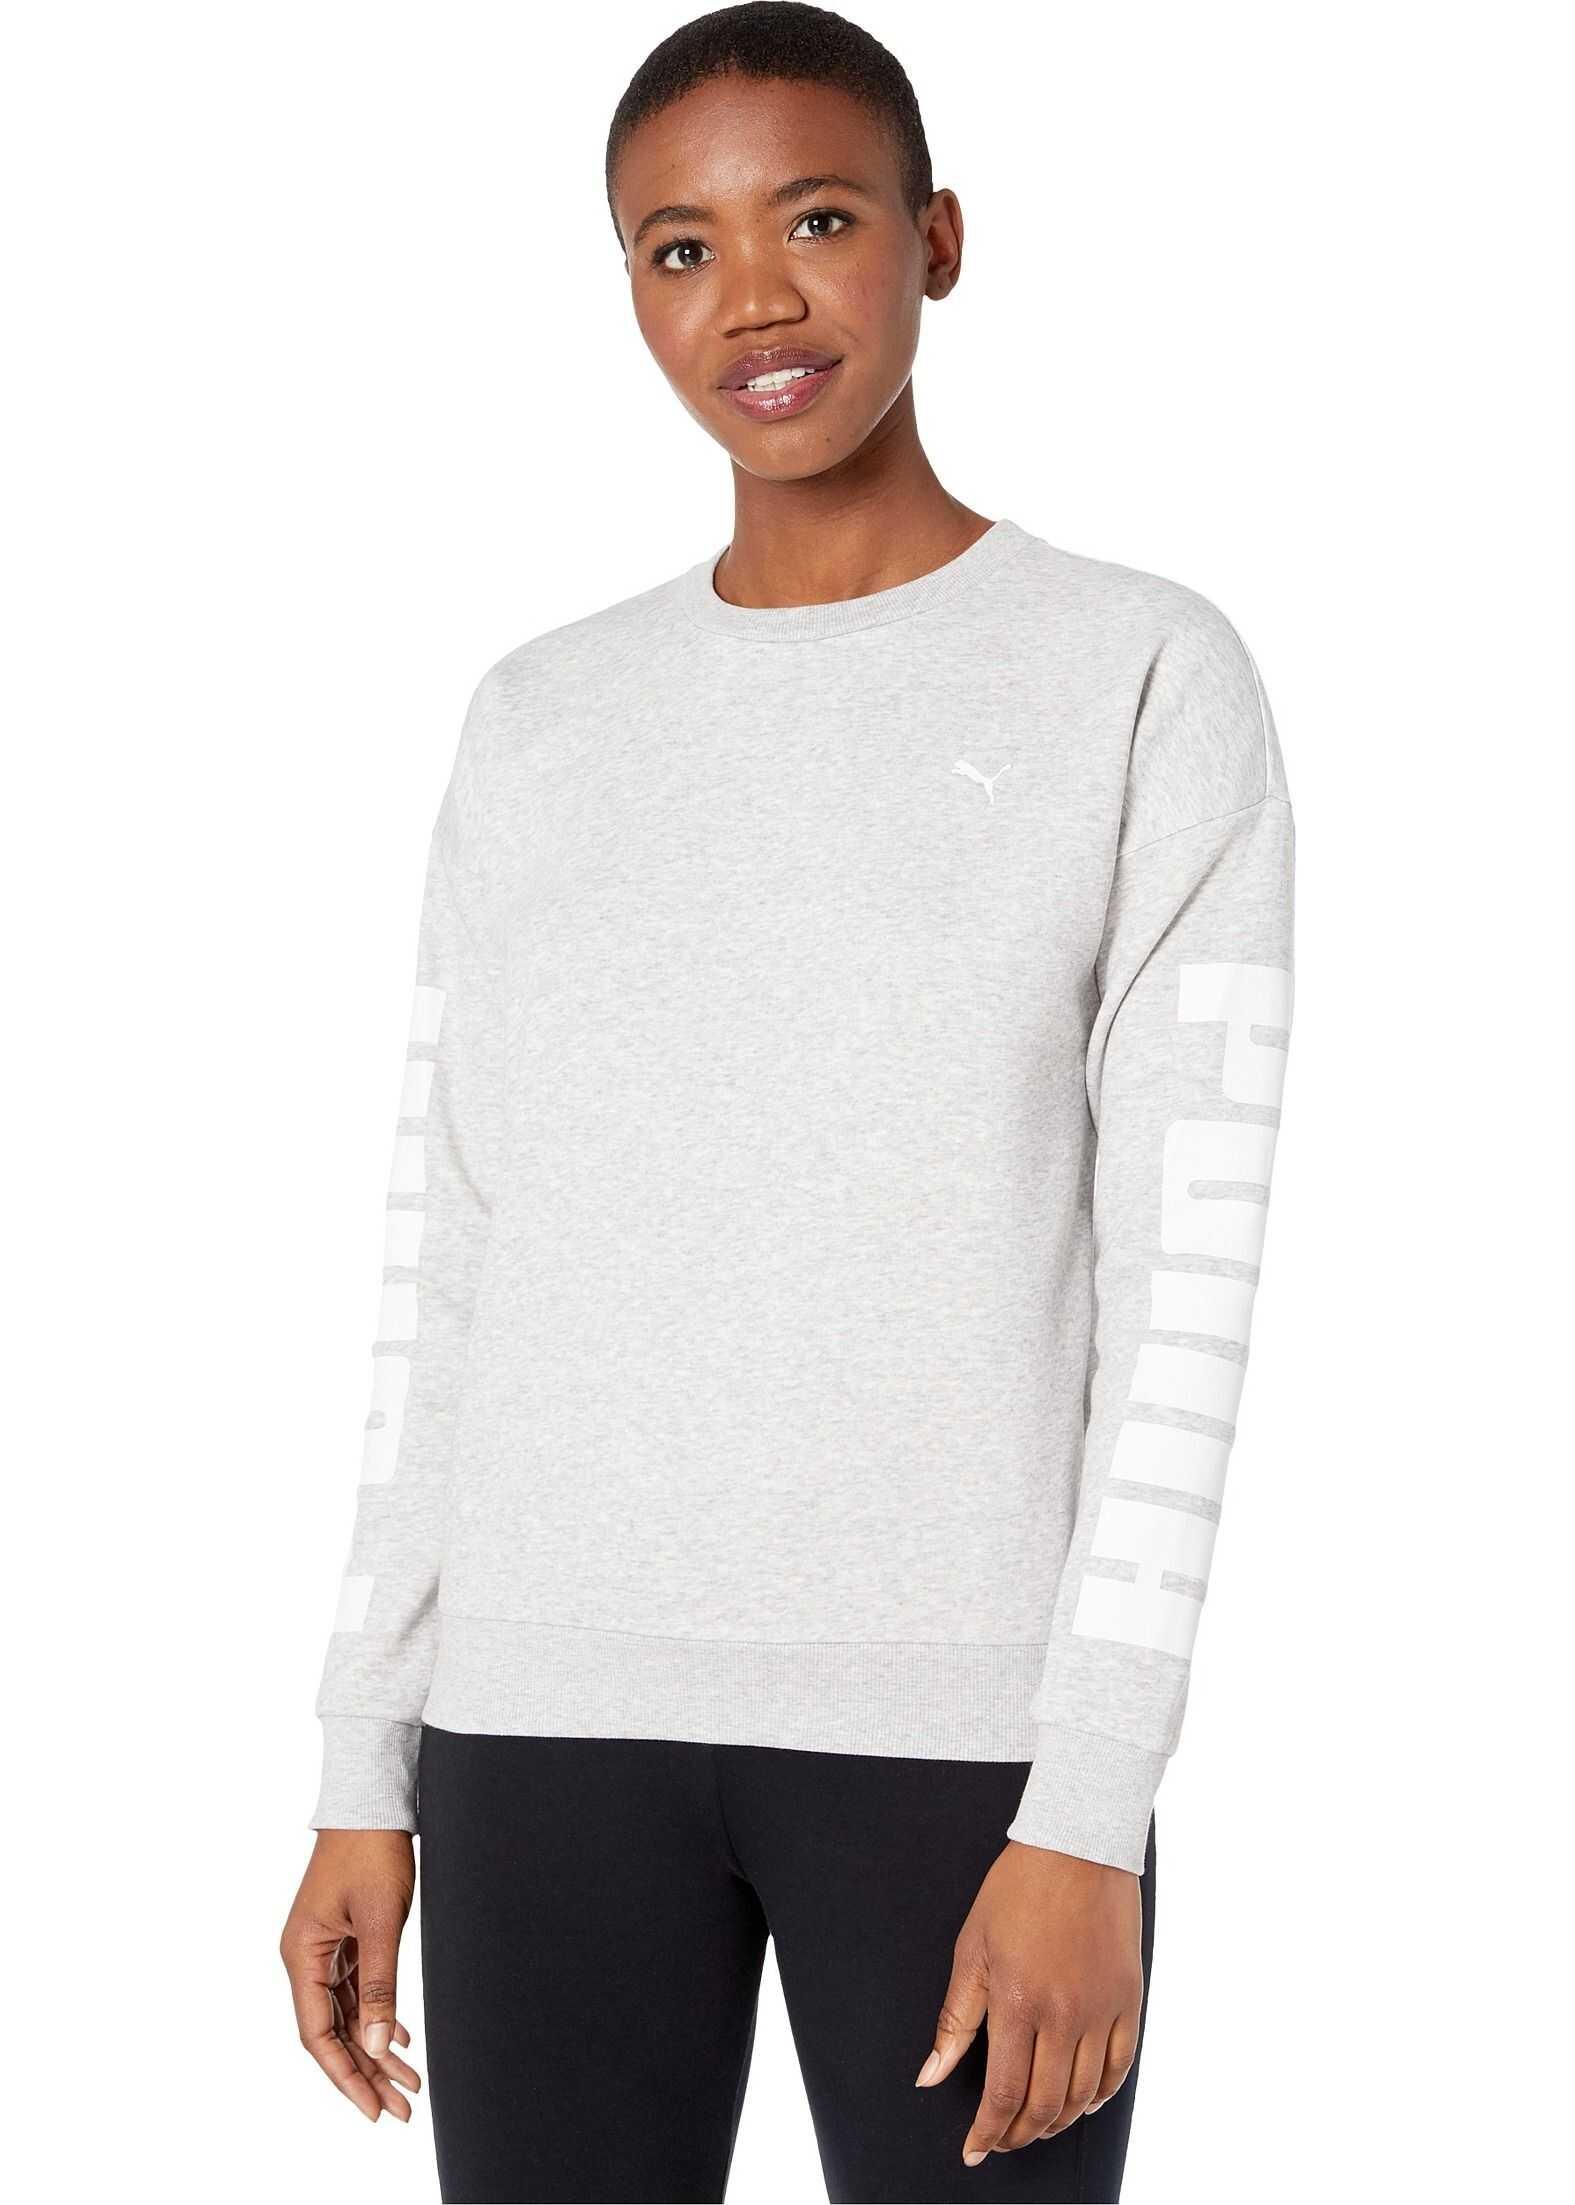 PUMA Rebel Fleece Crew Sweatshirt Light Gray Heather